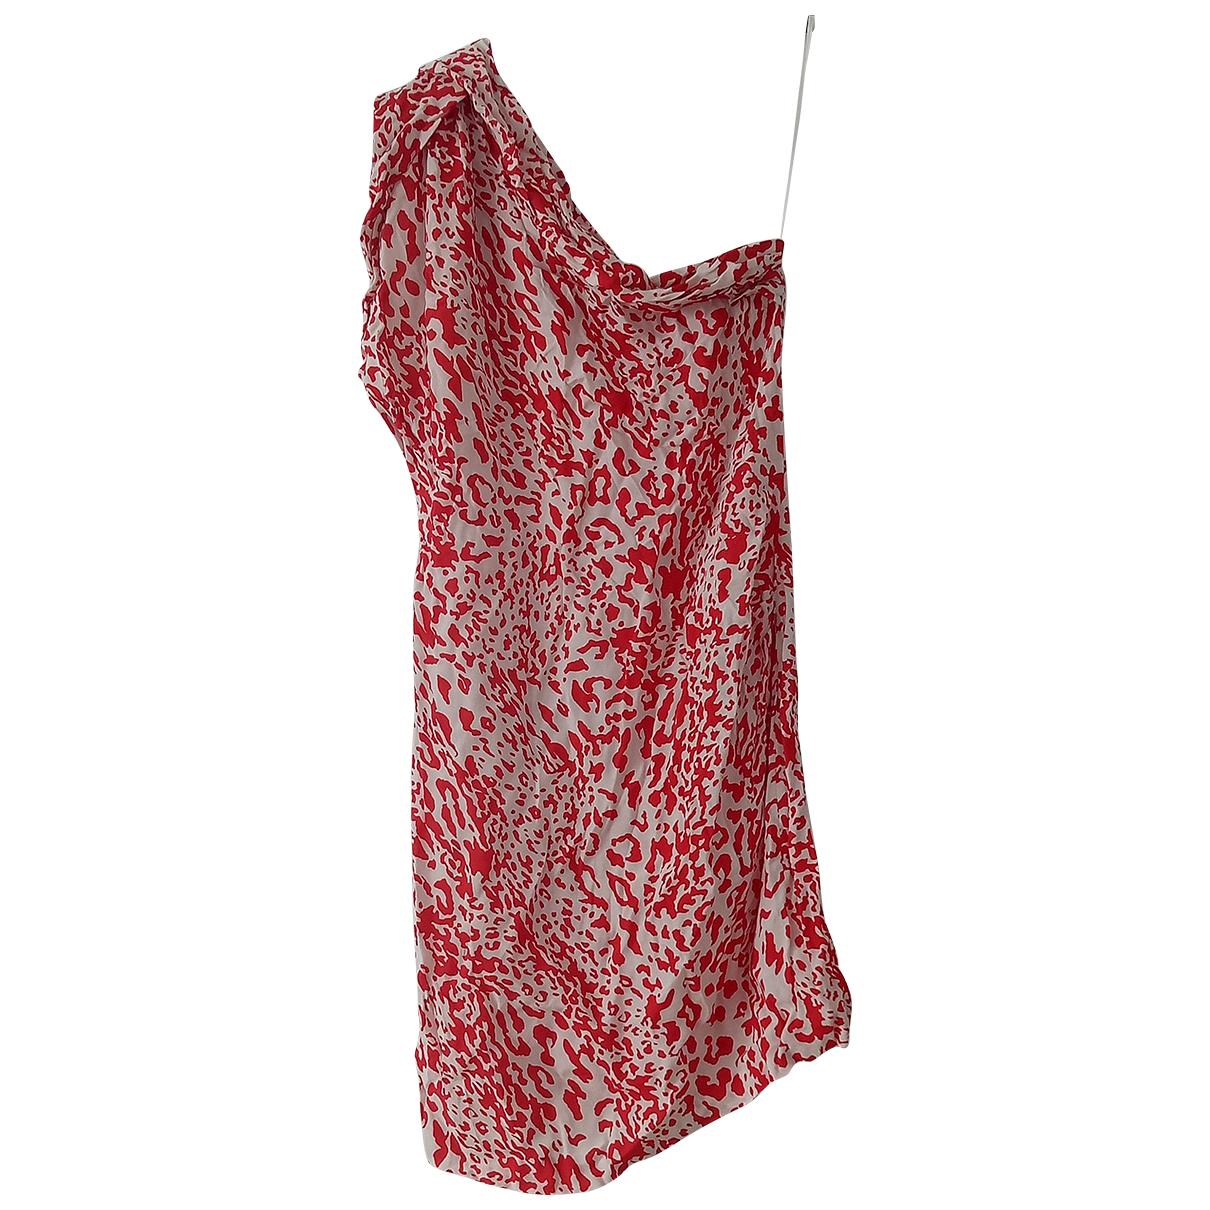 Maje - Robe Spring Summer 2019 pour femme - rouge